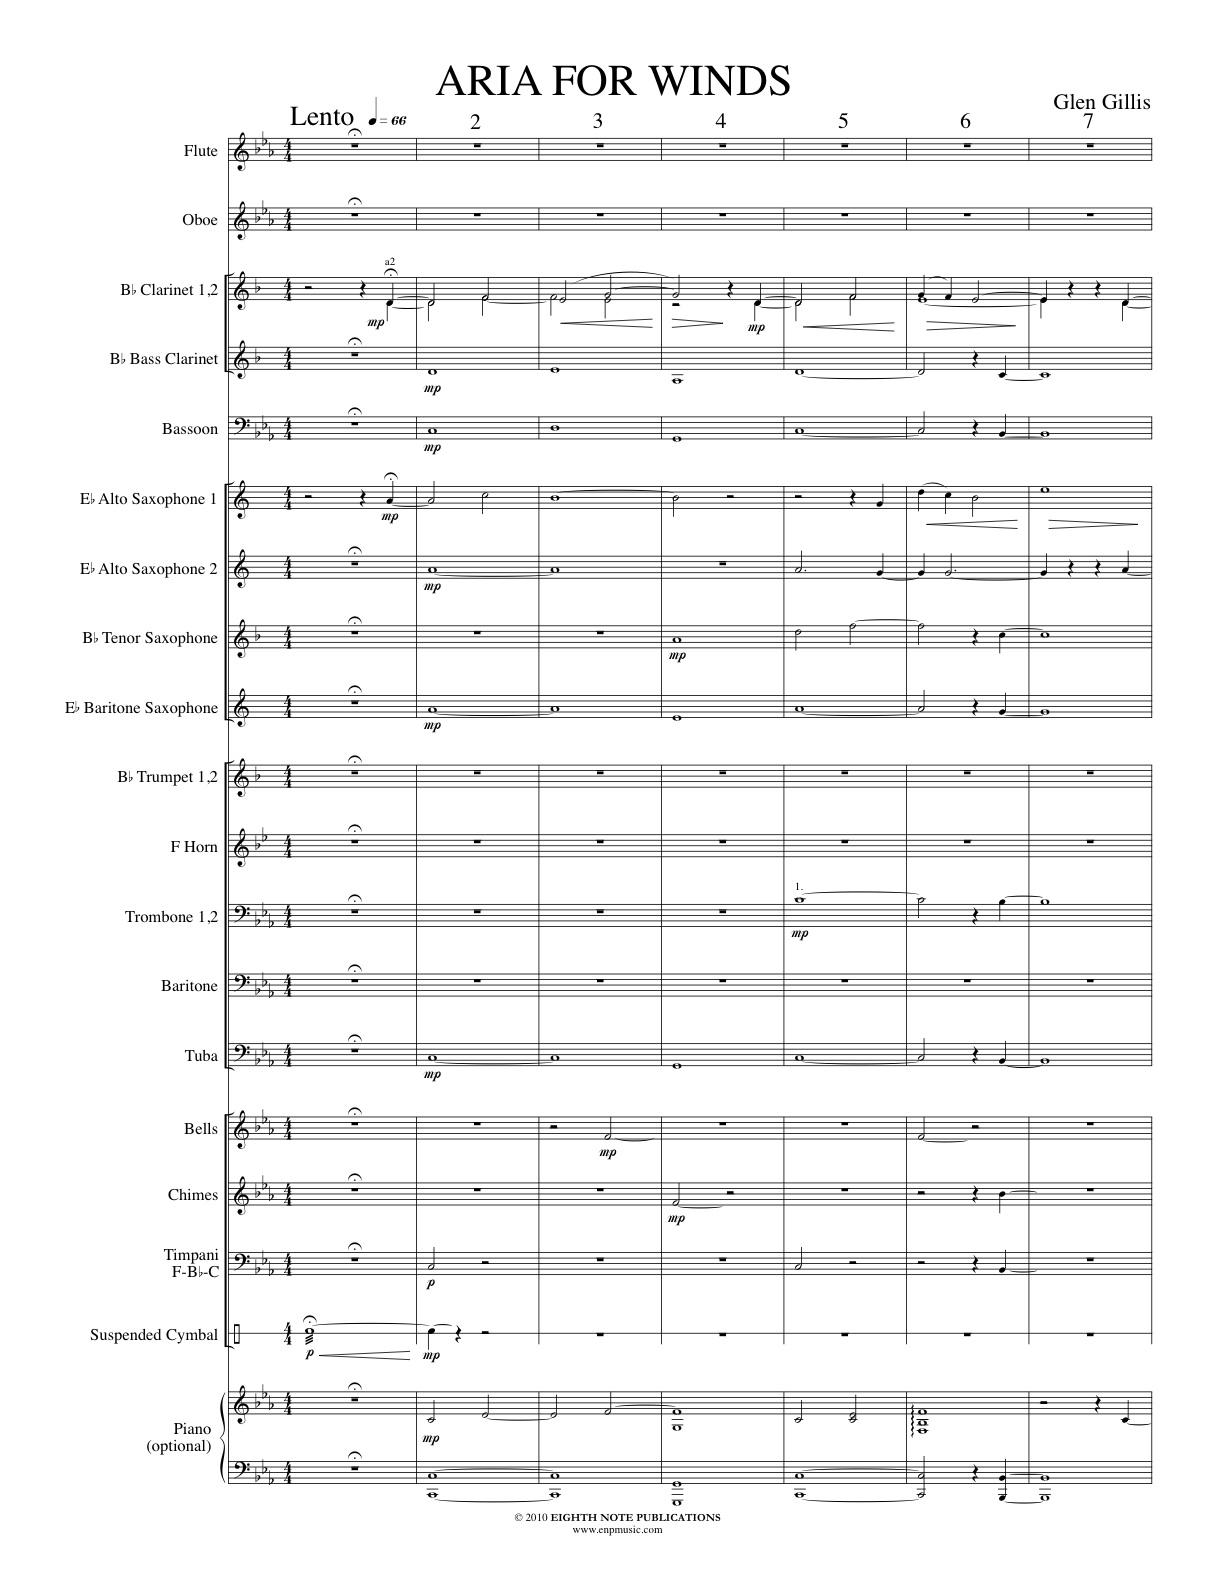 Aria for Winds - Glen Gillis